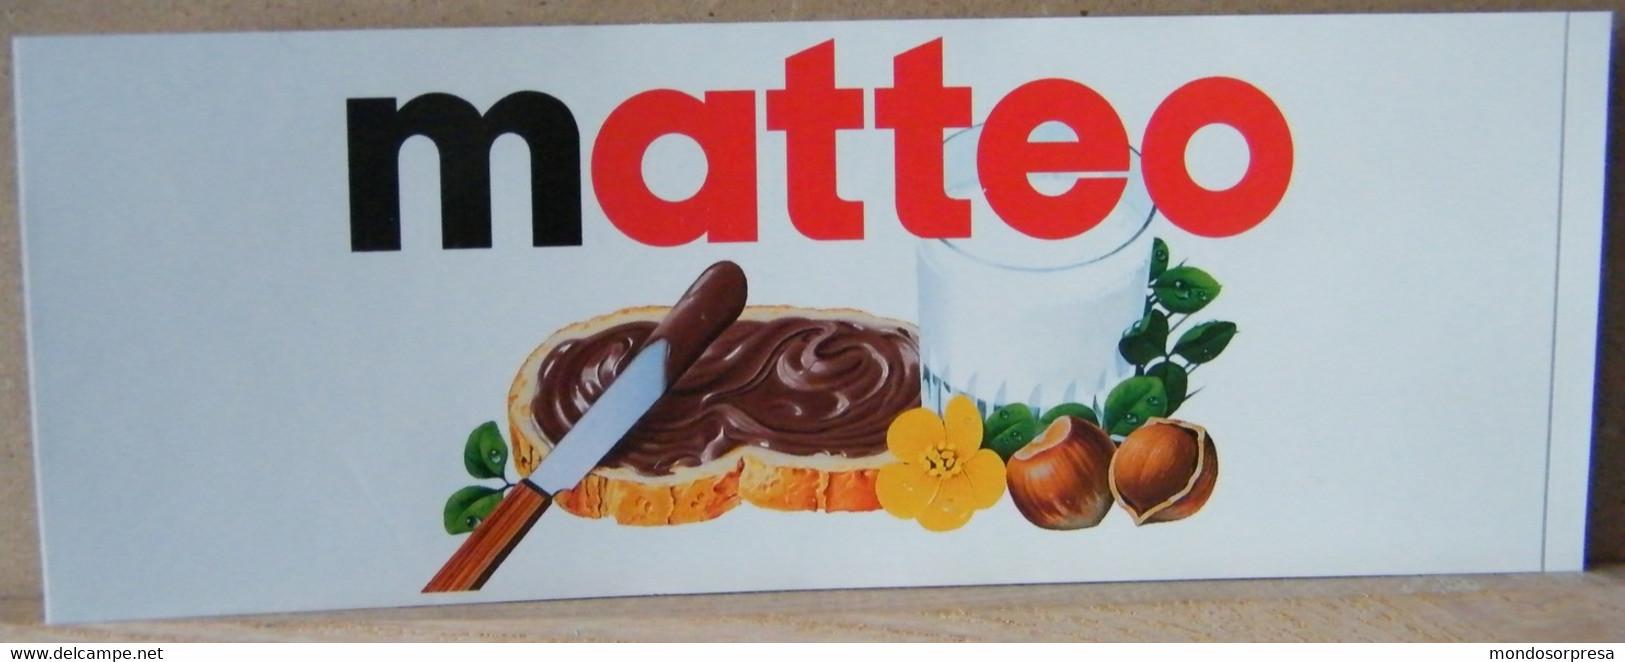 MONDOSORPRESA, ADESIVI NUTELLA NOMI, MATTEO - Nutella